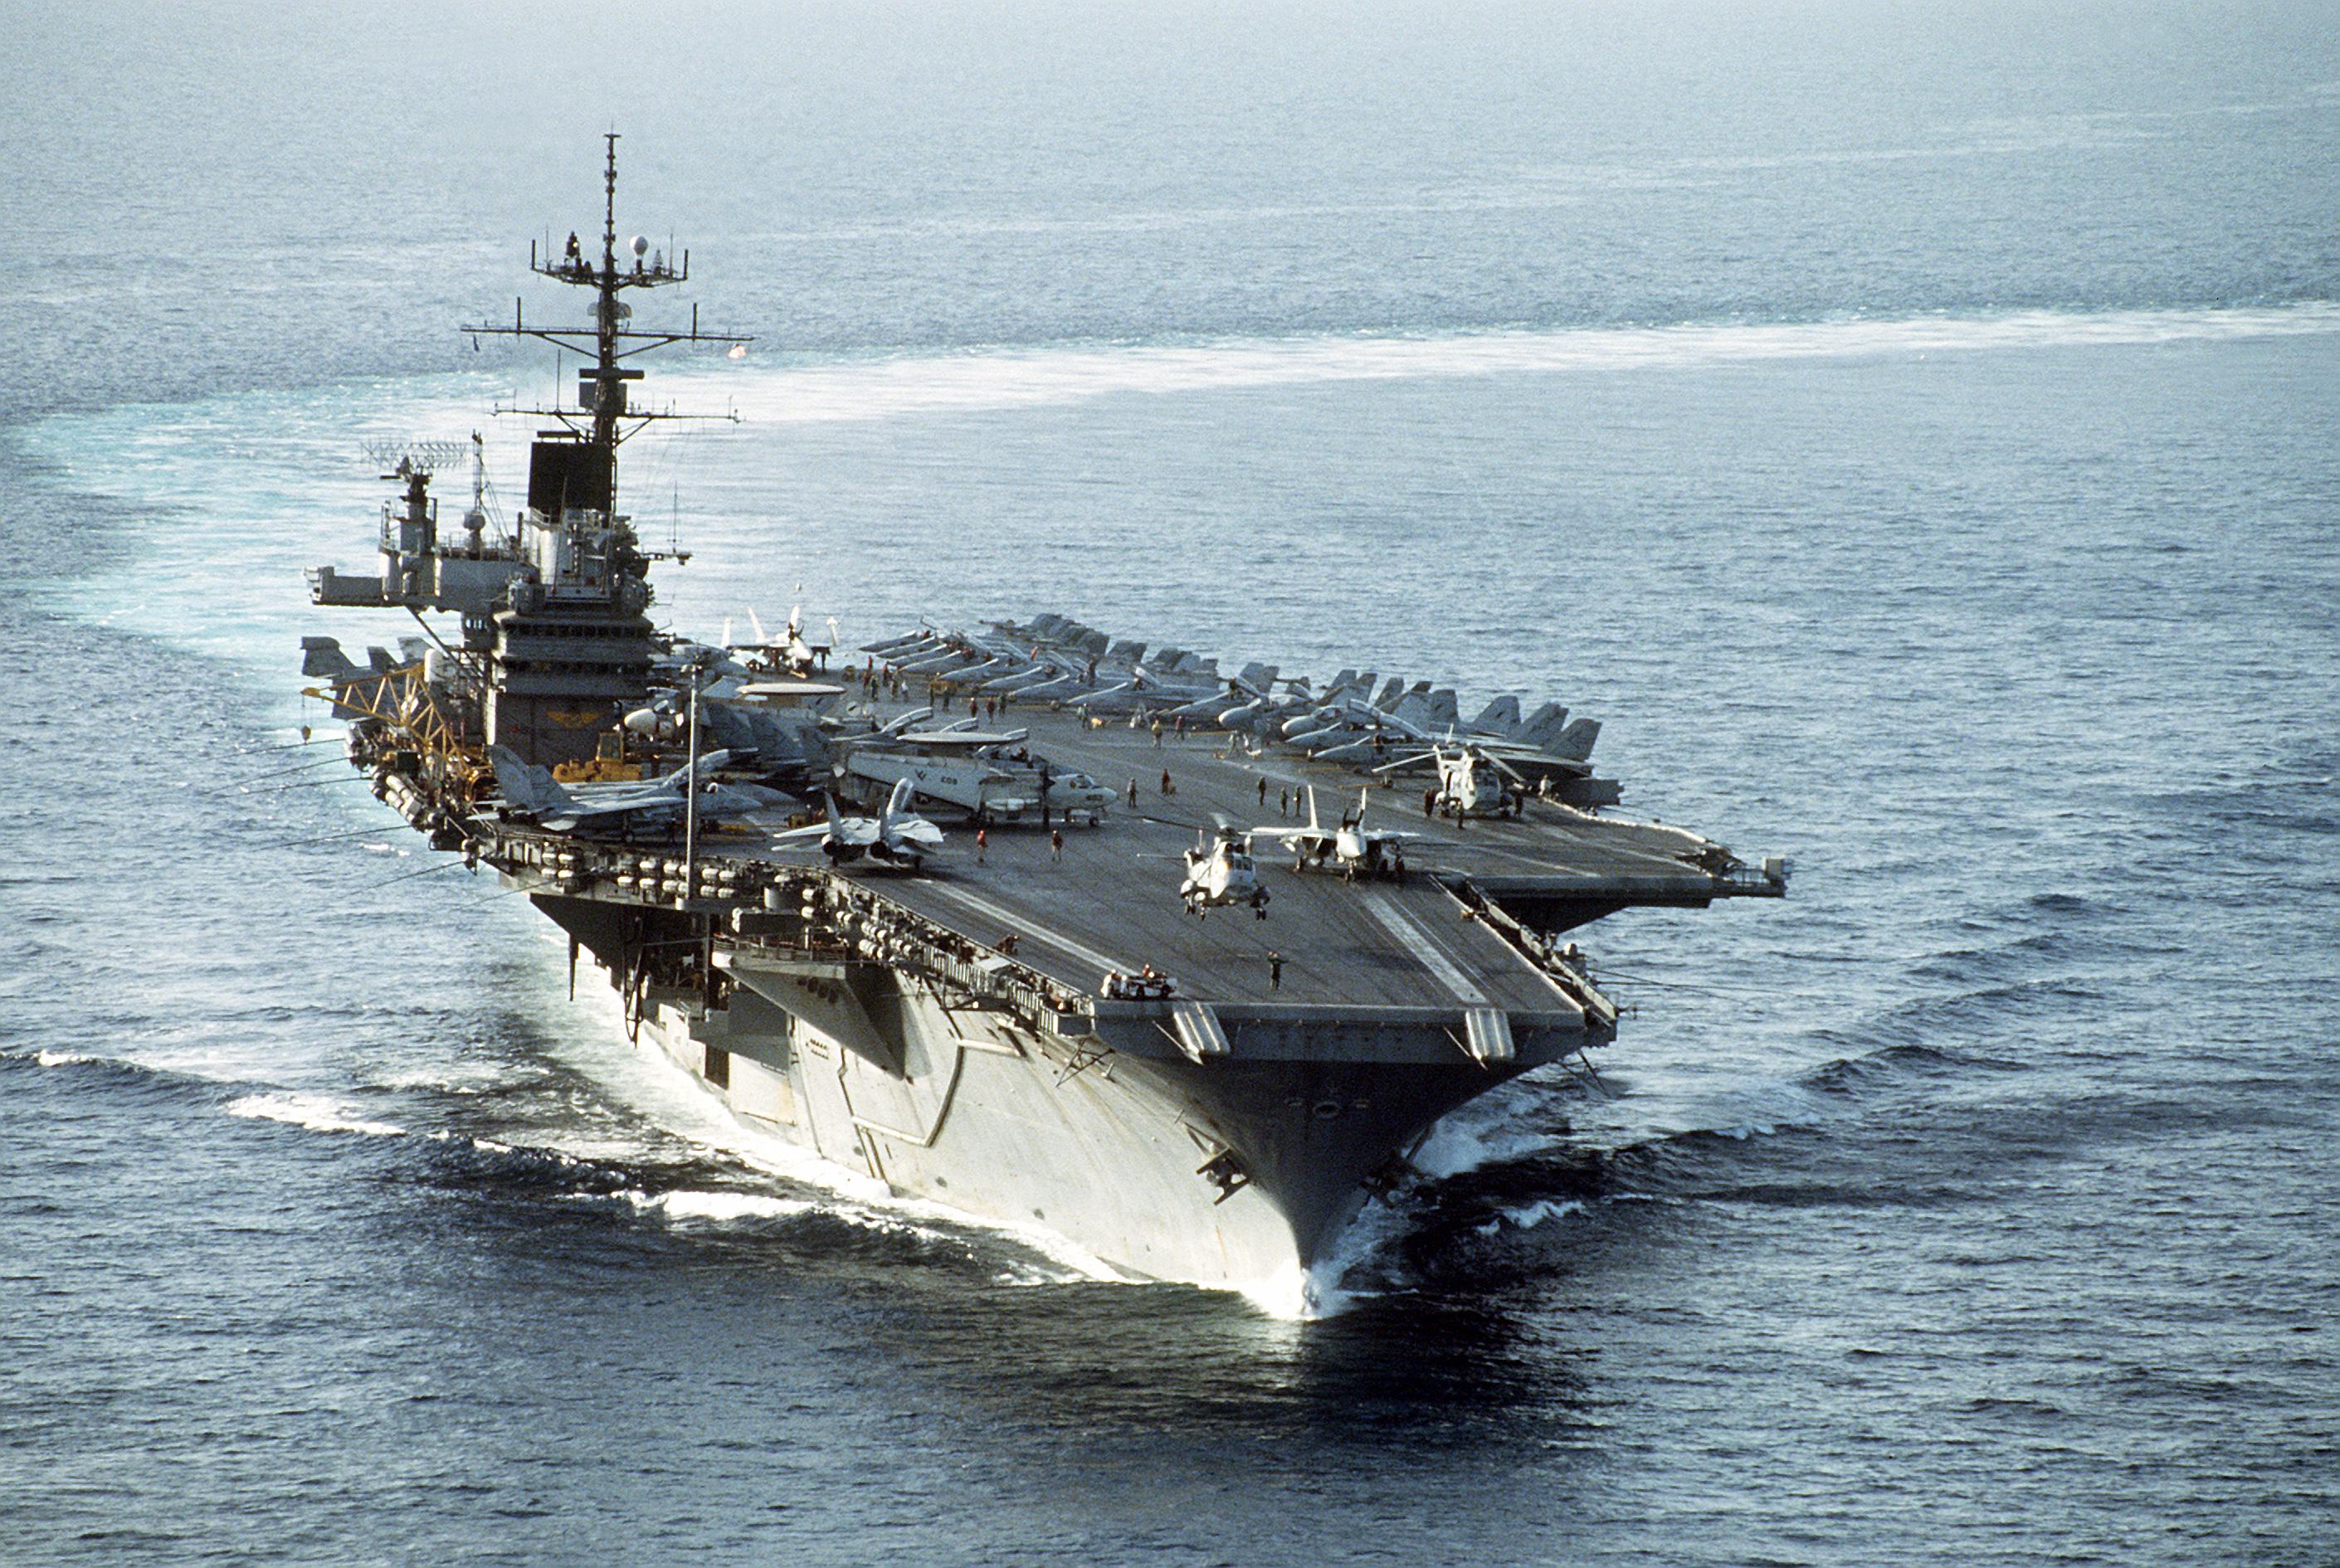 [Image: USS_Saratoga_(CV-60)_underway_during_Desert_Storm.jpg]